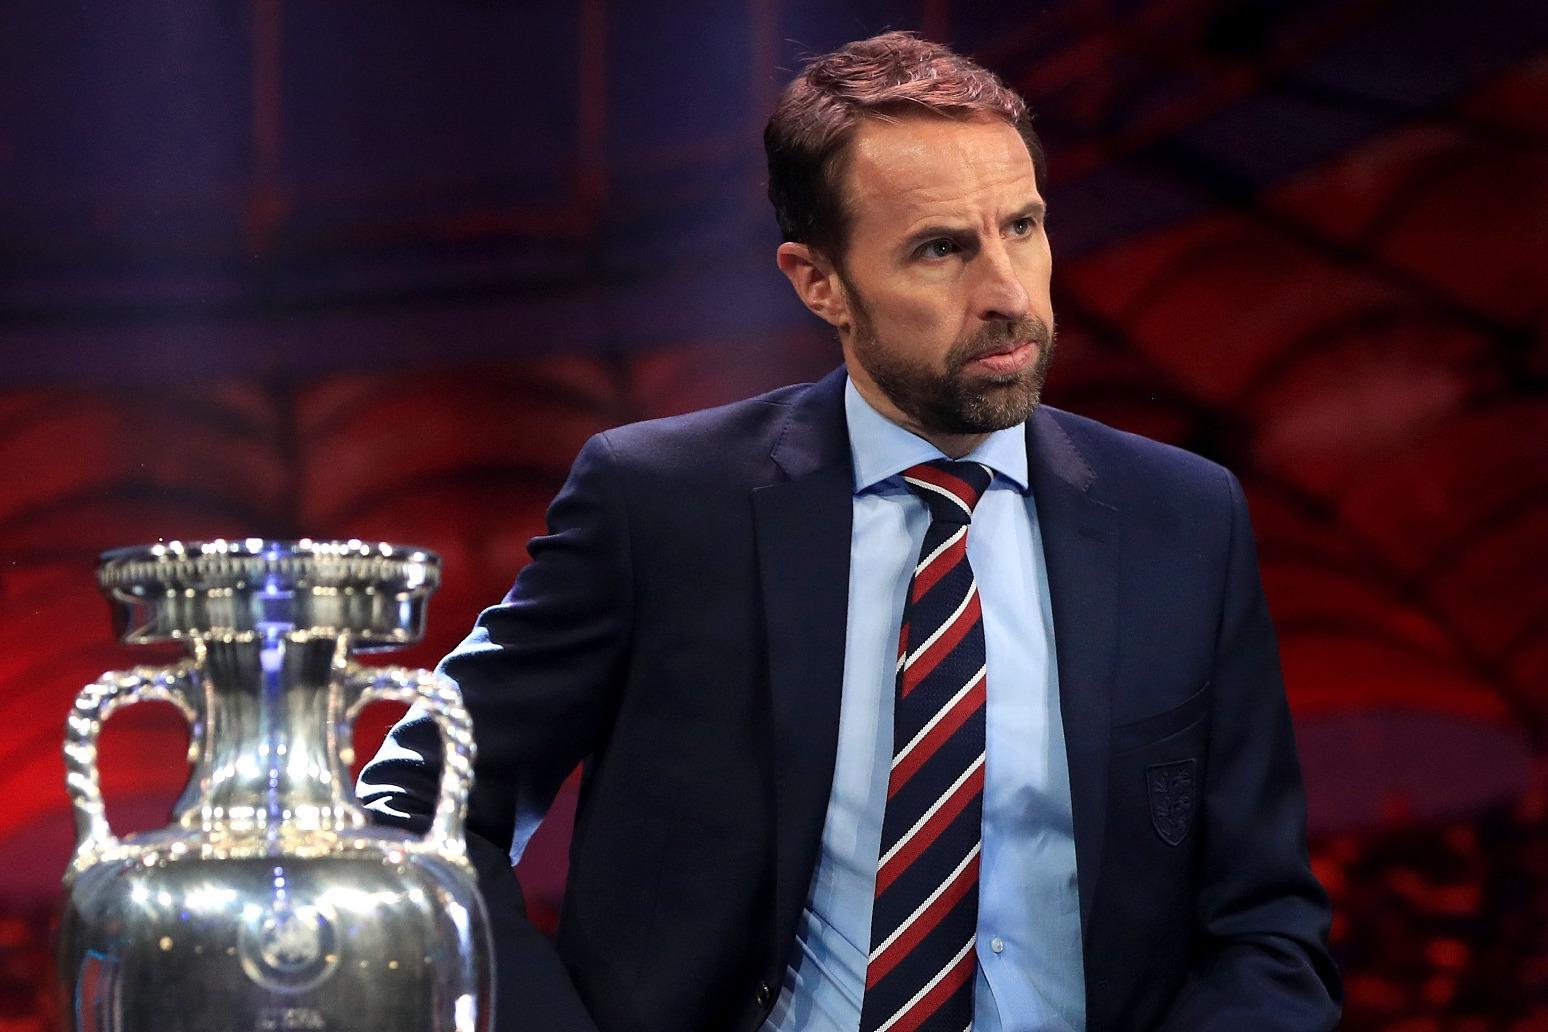 England Team for Euros 2020 Announced